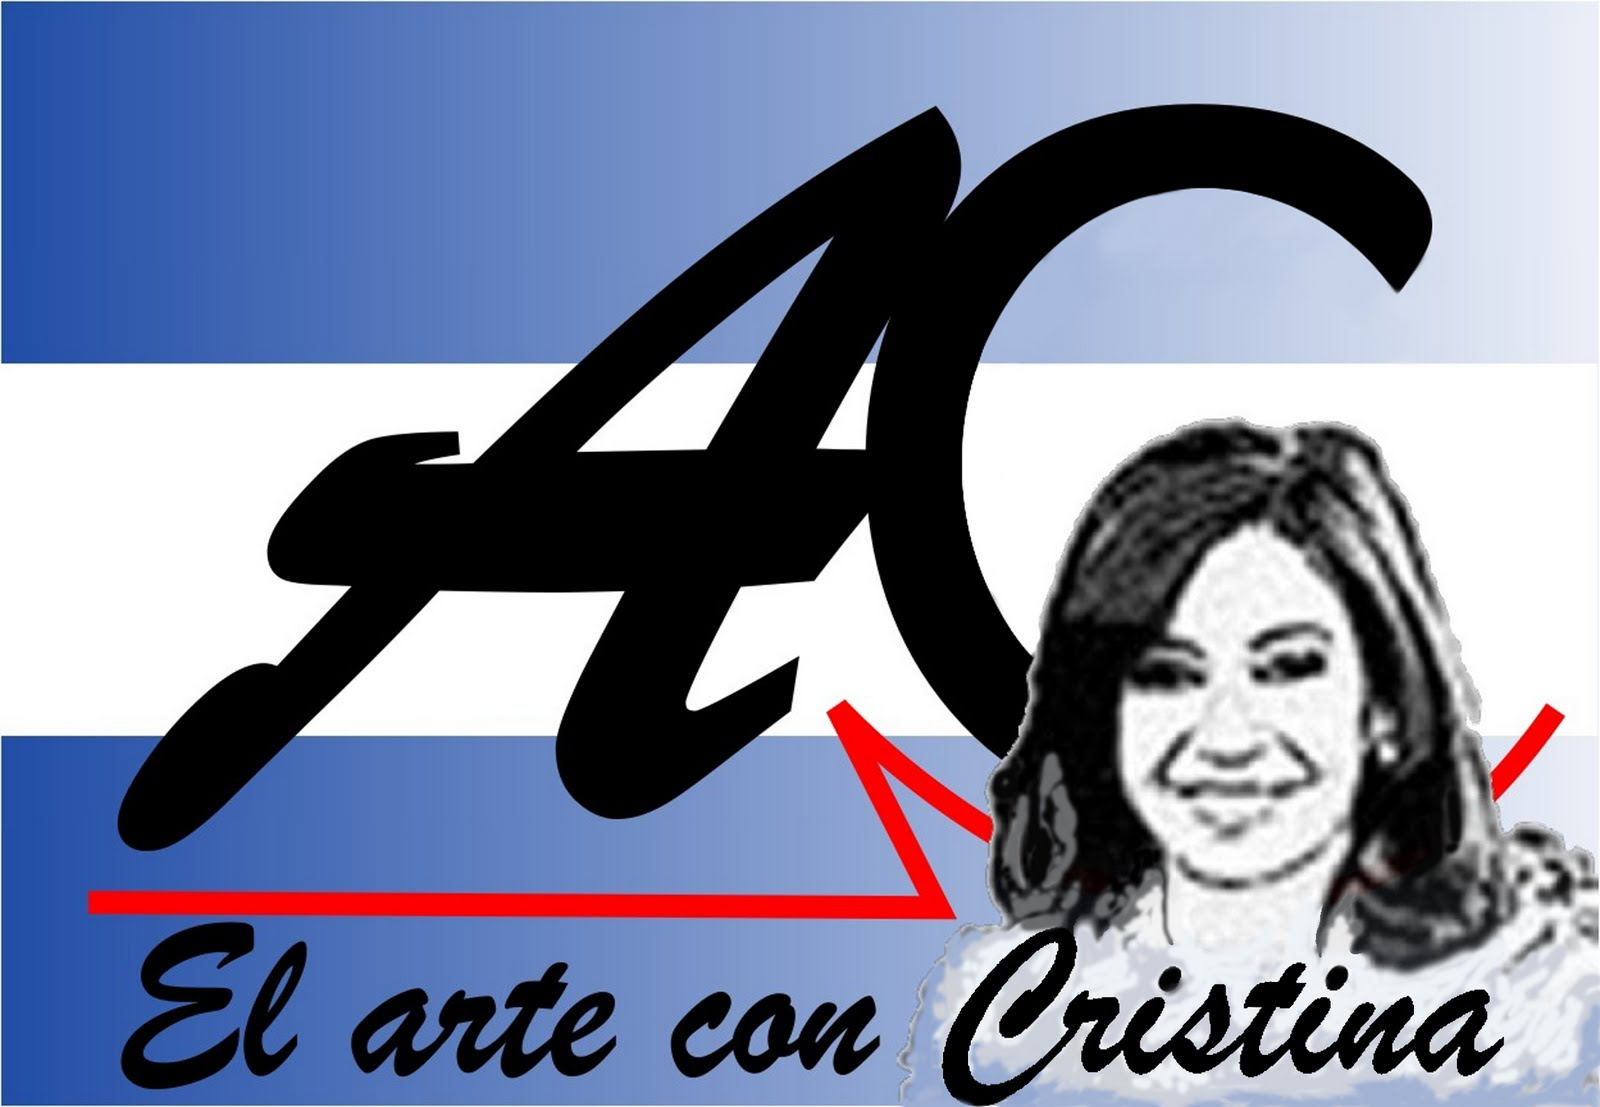 El arte con Cristina